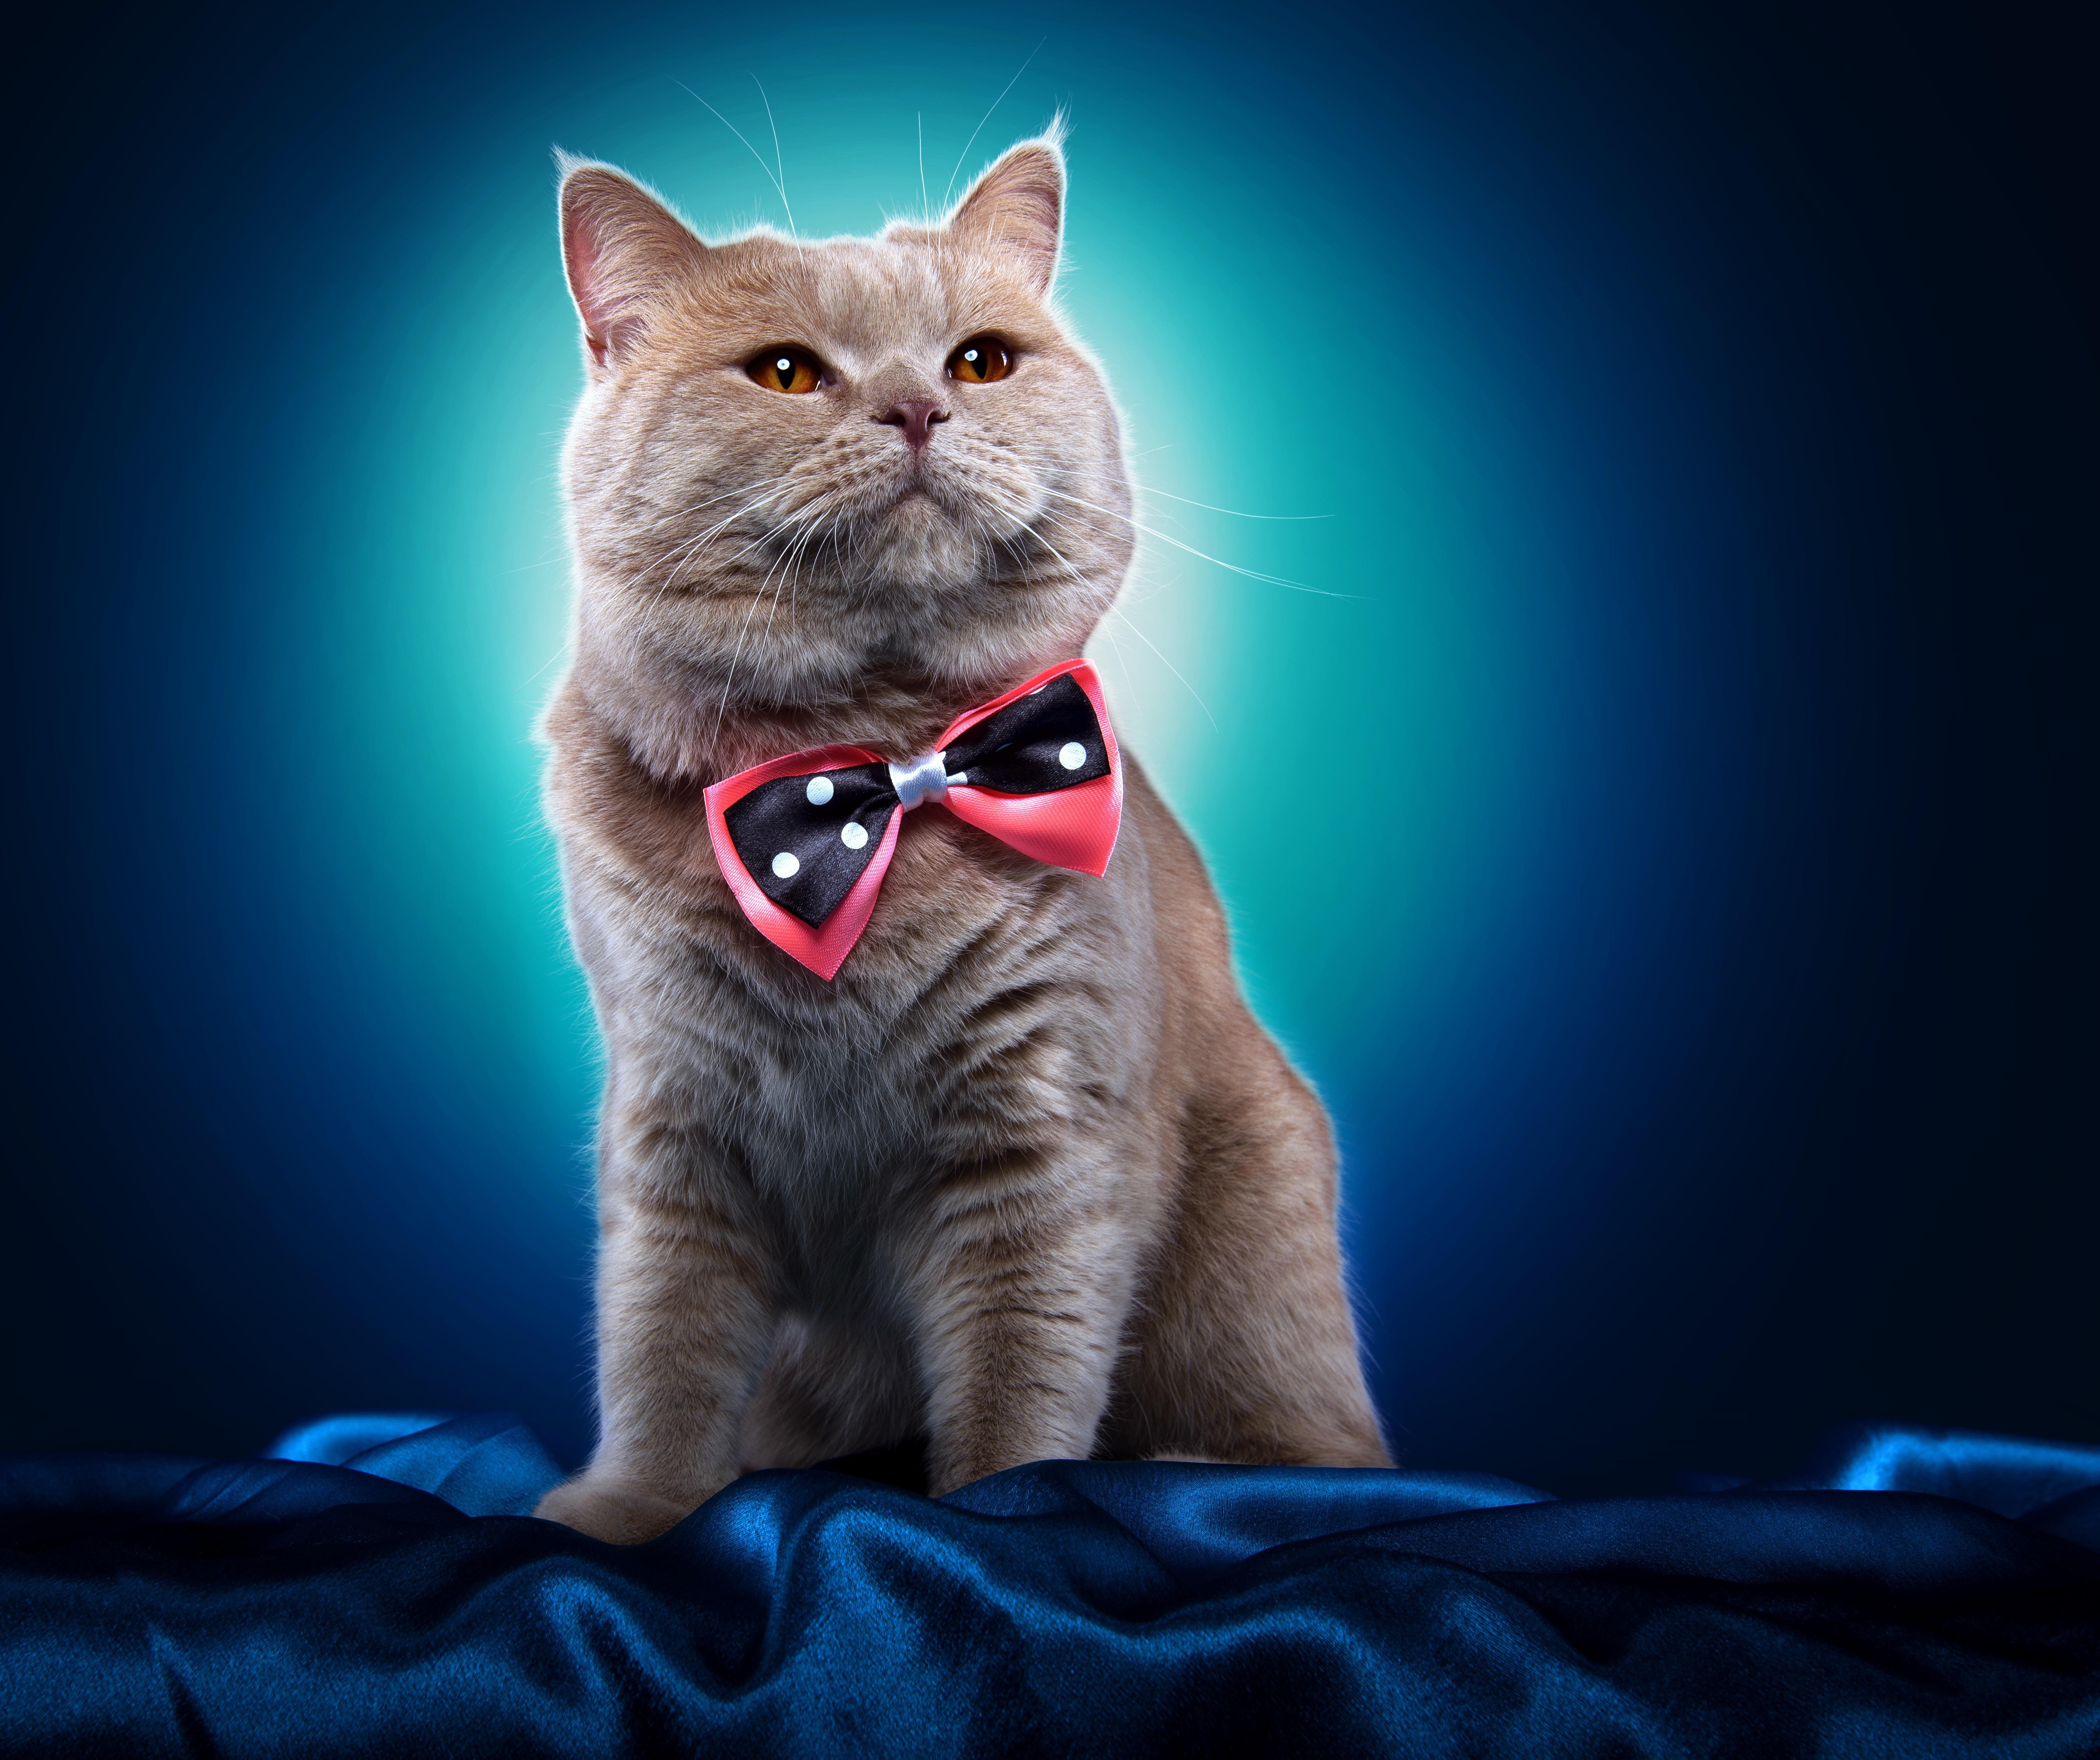 Котик, валентин александрович